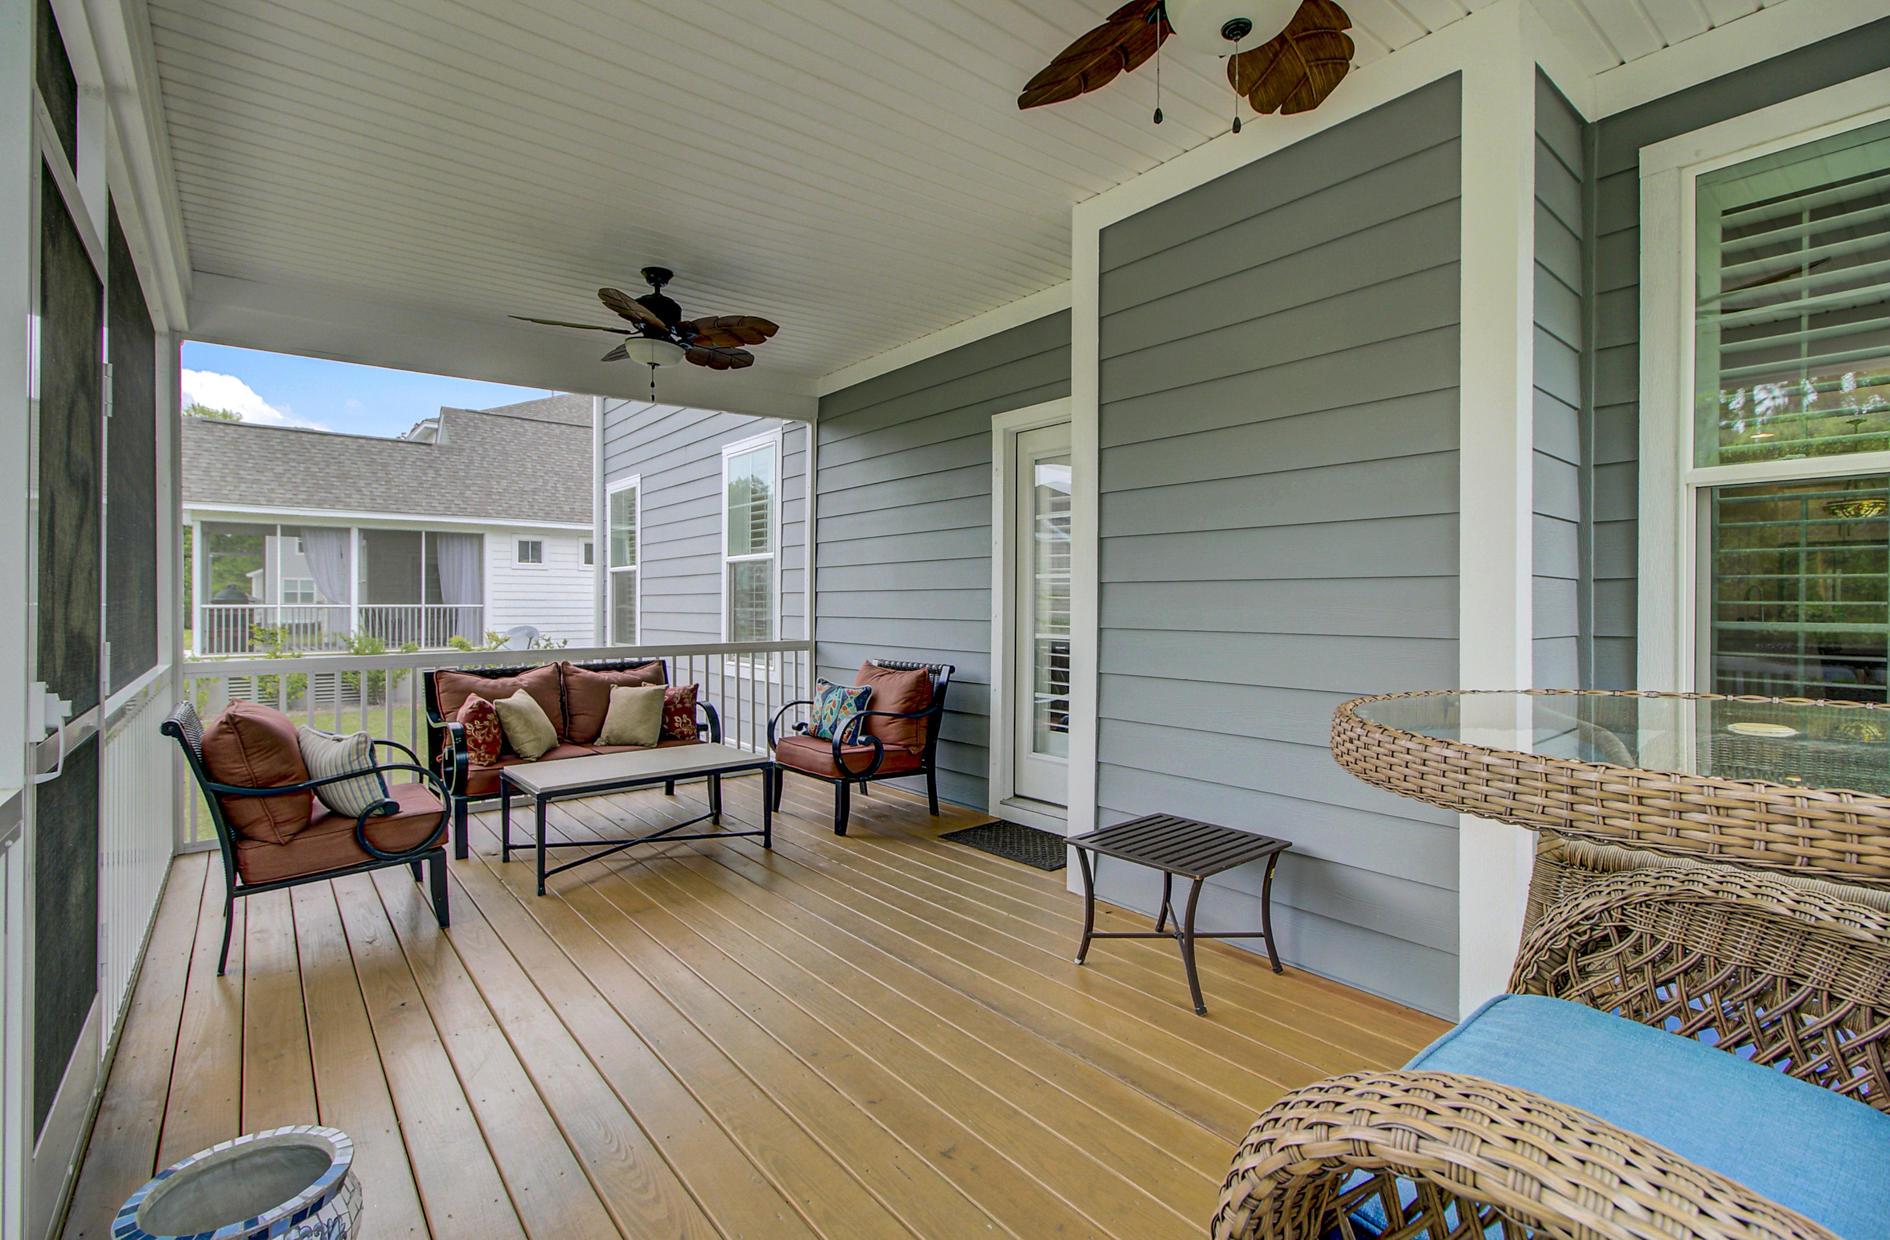 Park West Homes For Sale - 2824 Wagner, Mount Pleasant, SC - 22